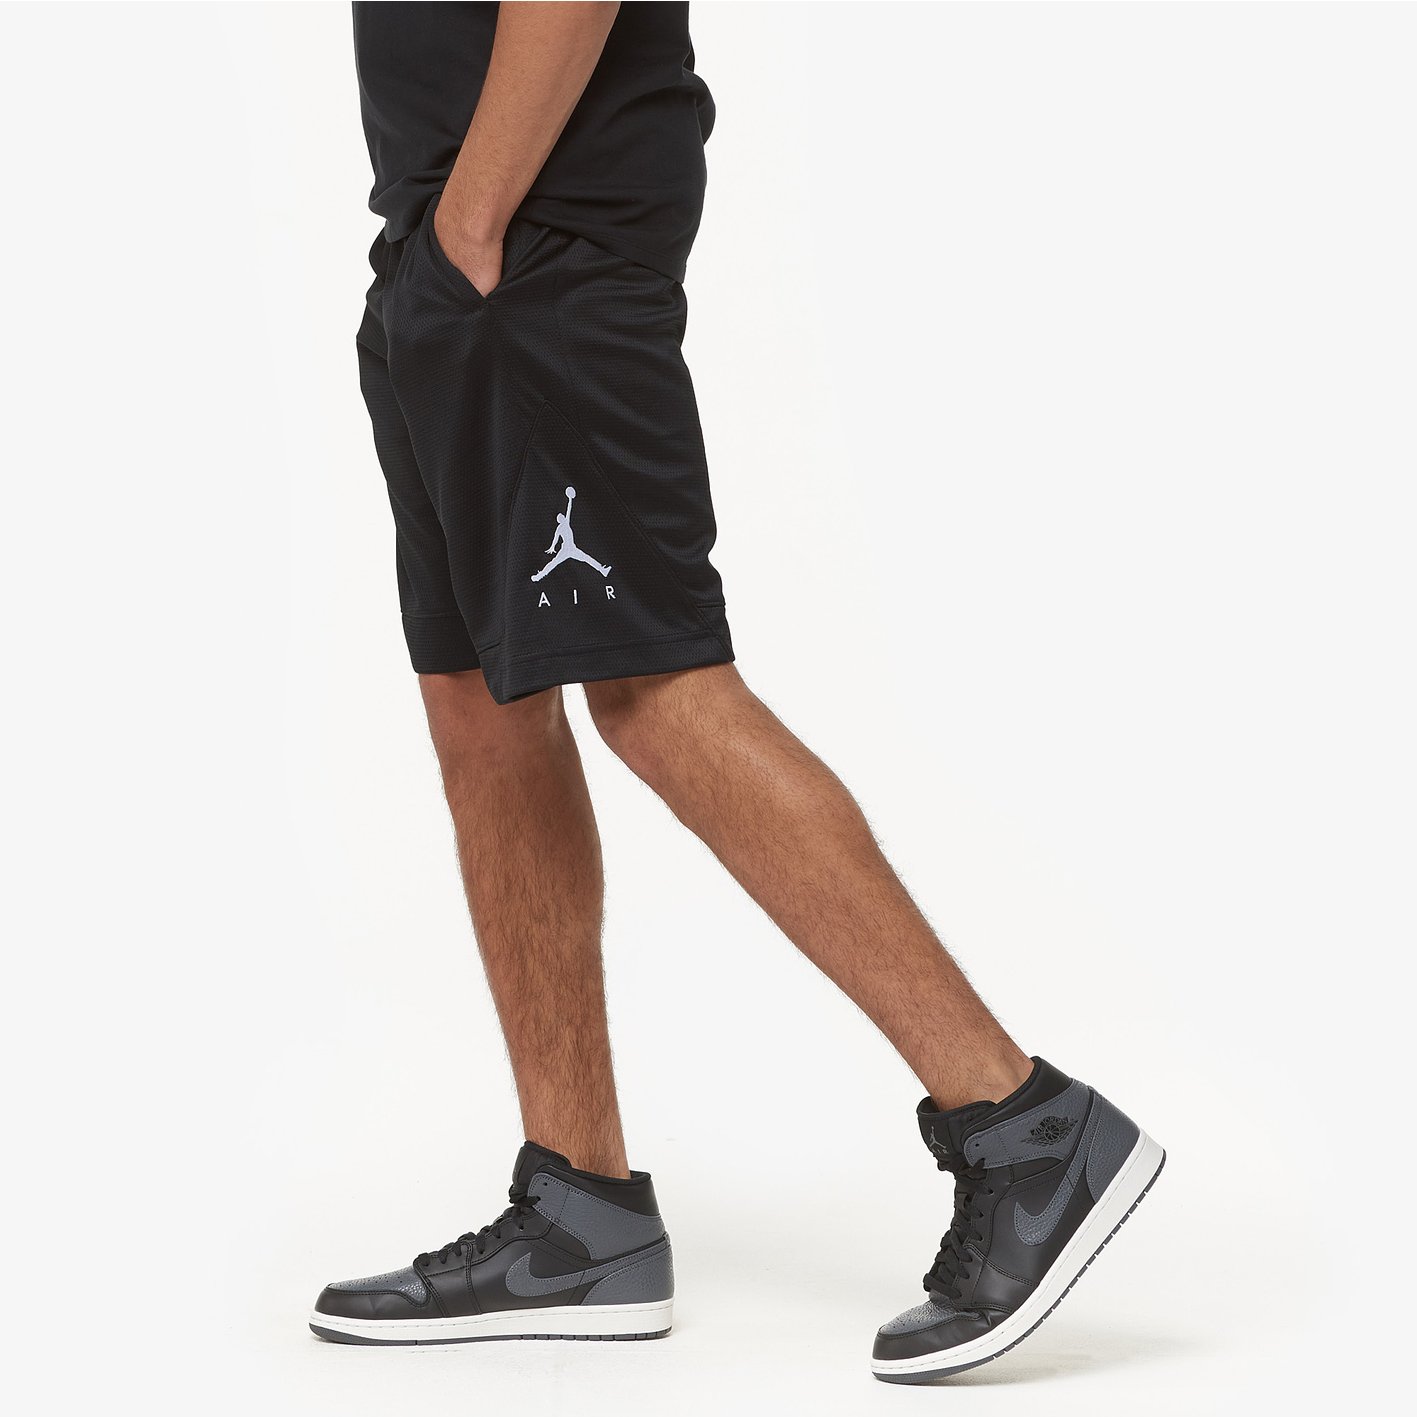 ae674e086b68 Jordan Rise Striped Triangle Shorts - Men s - Basketball - Clothing ...